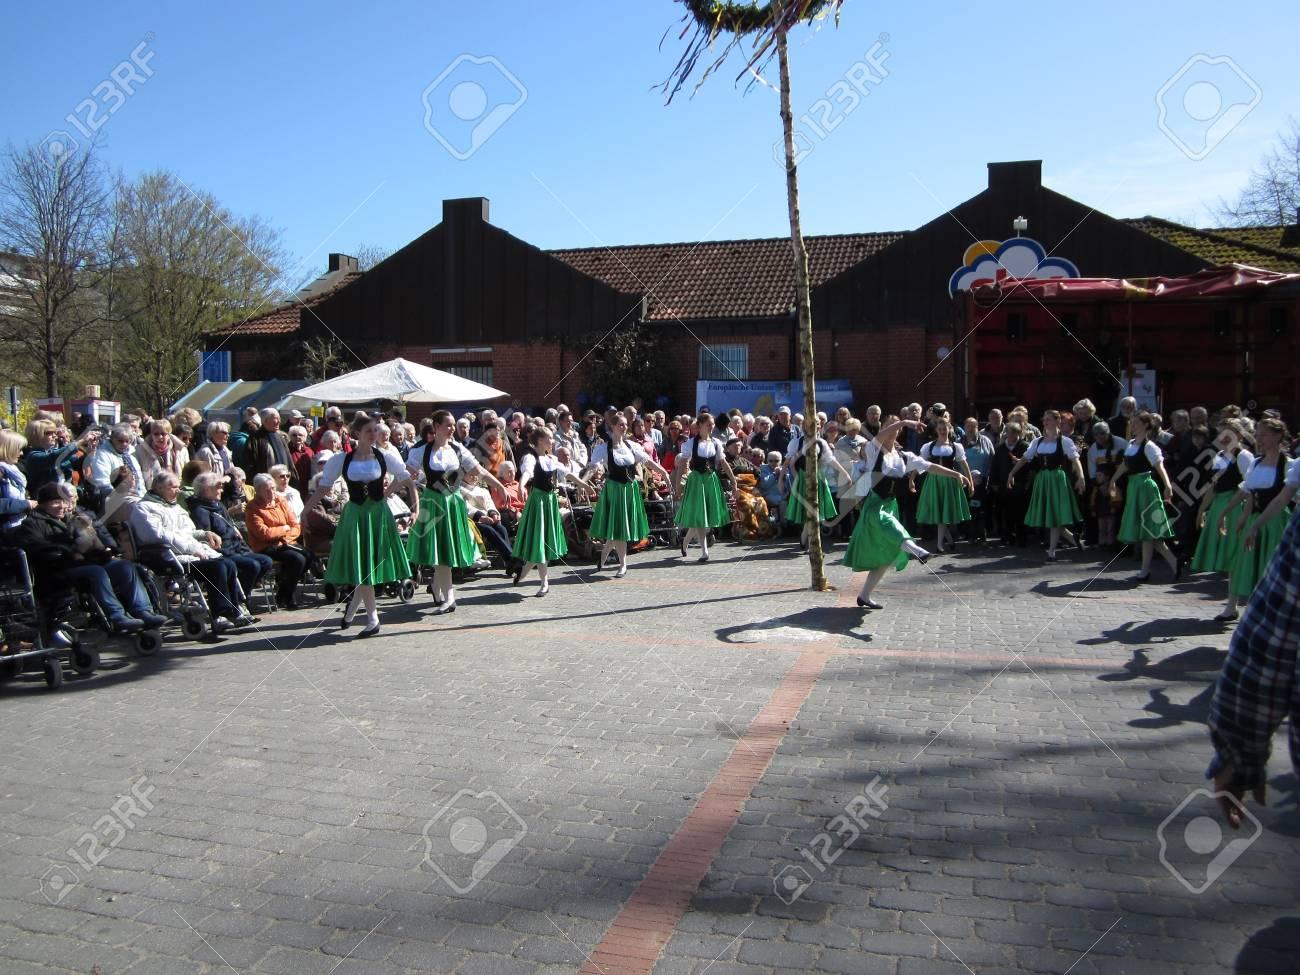 Dancing around the maypole Stock Photo - 20132896